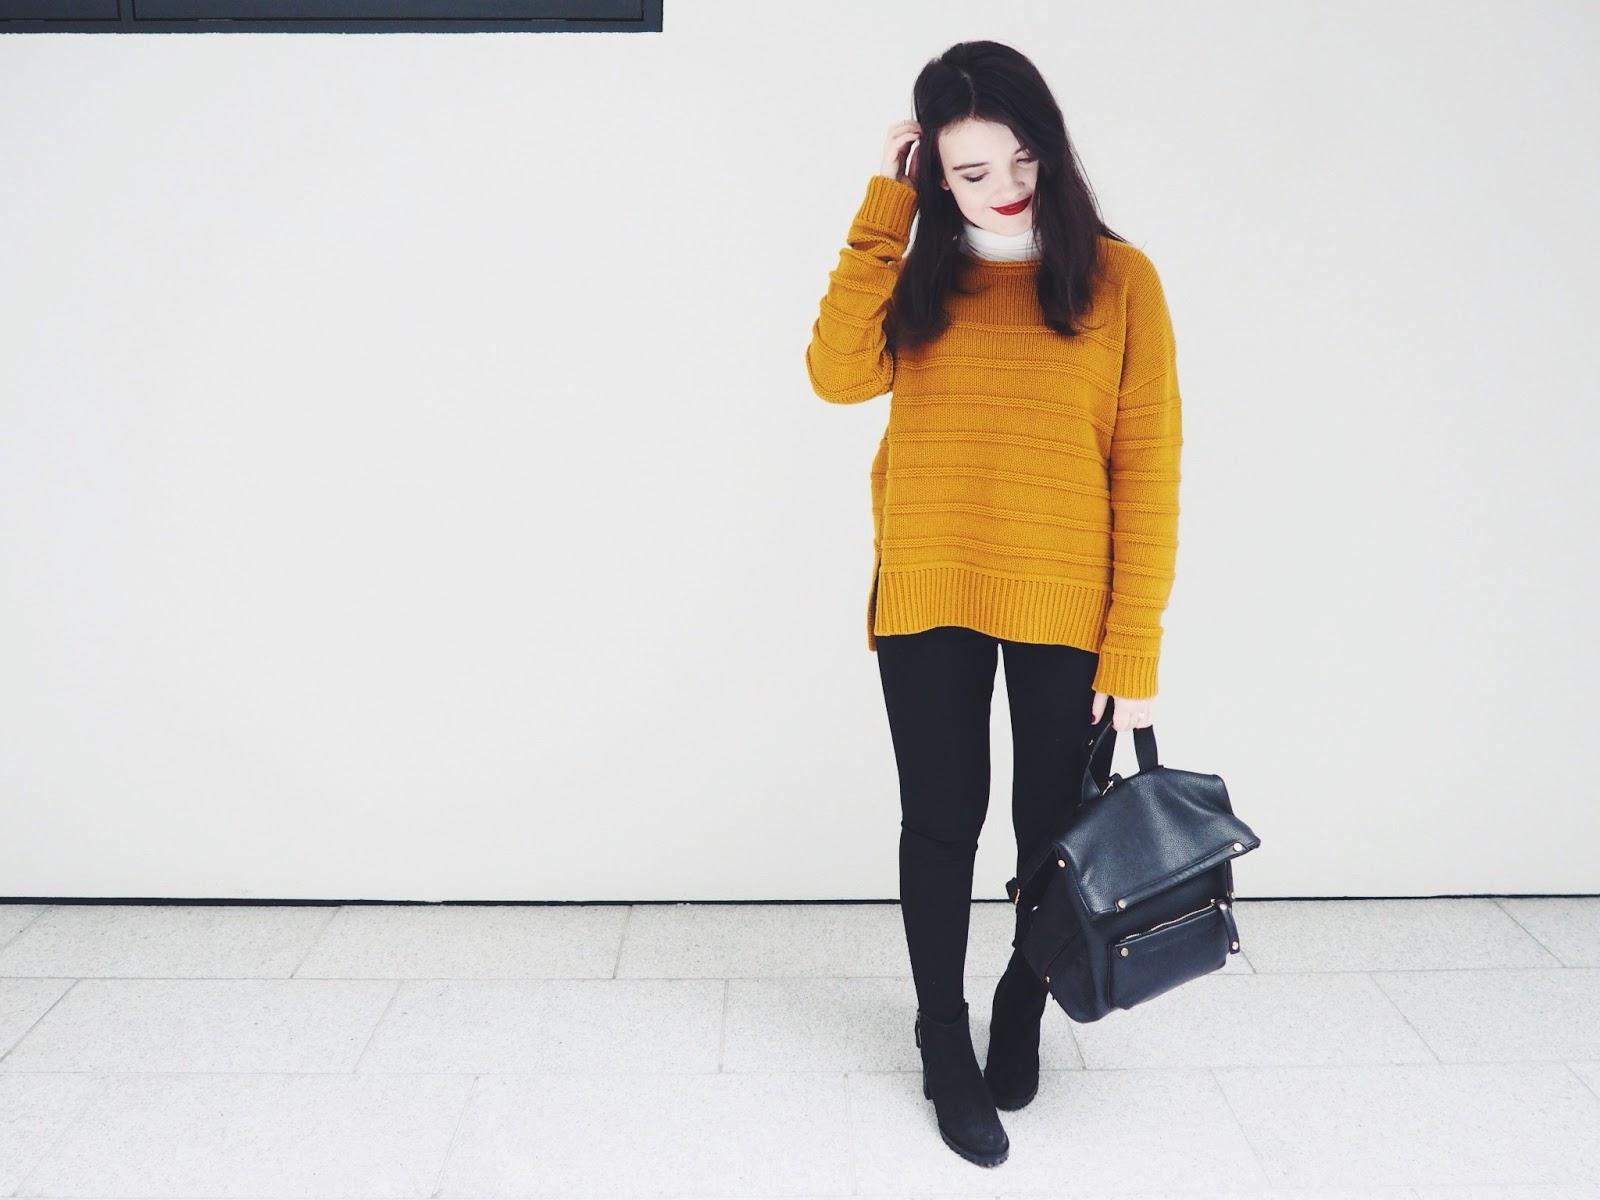 That mustard jumper.